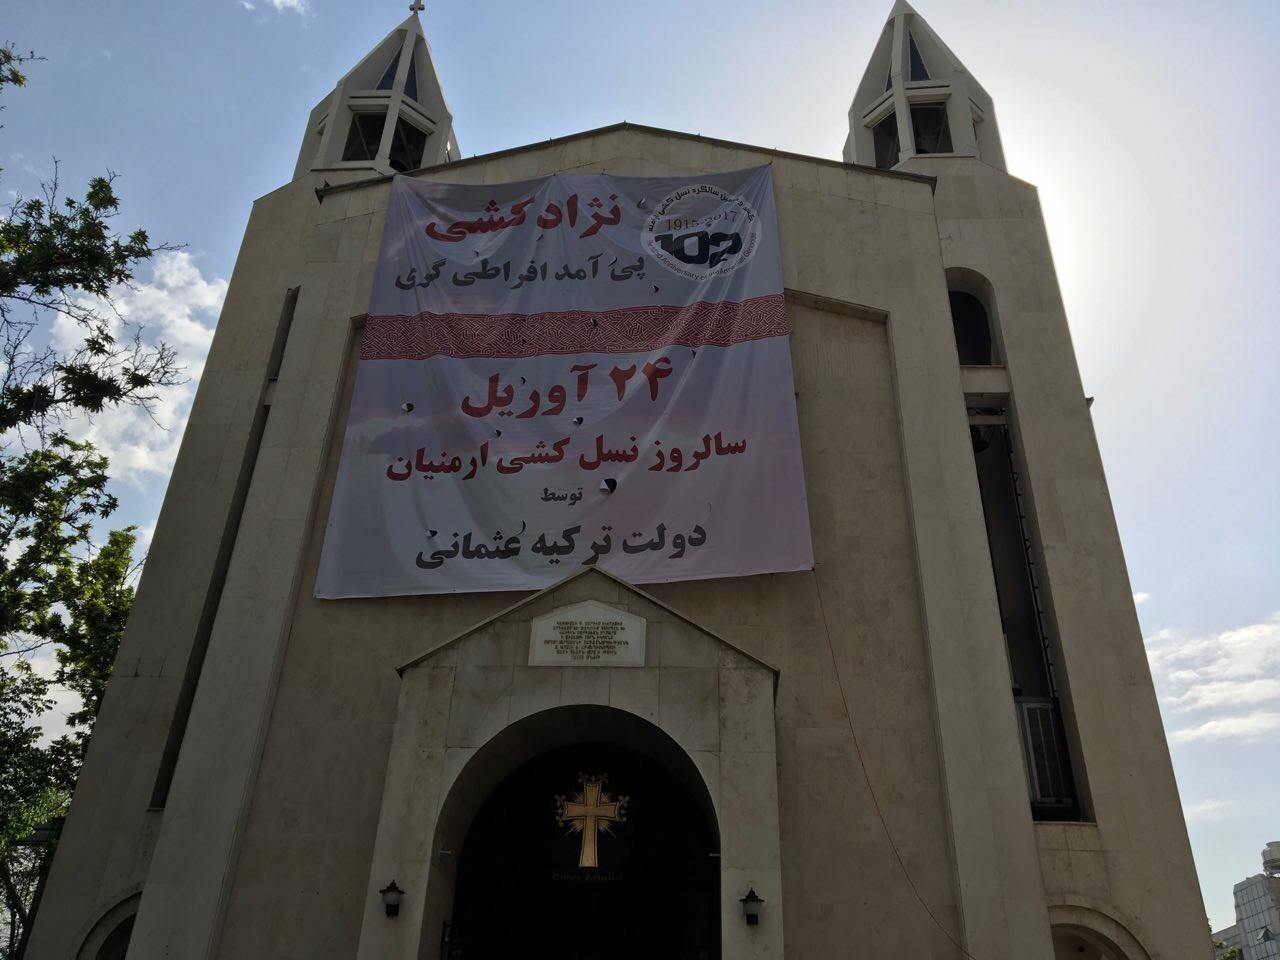 Worshipers gather at St. Sarkis Armenian Church in Tehran.